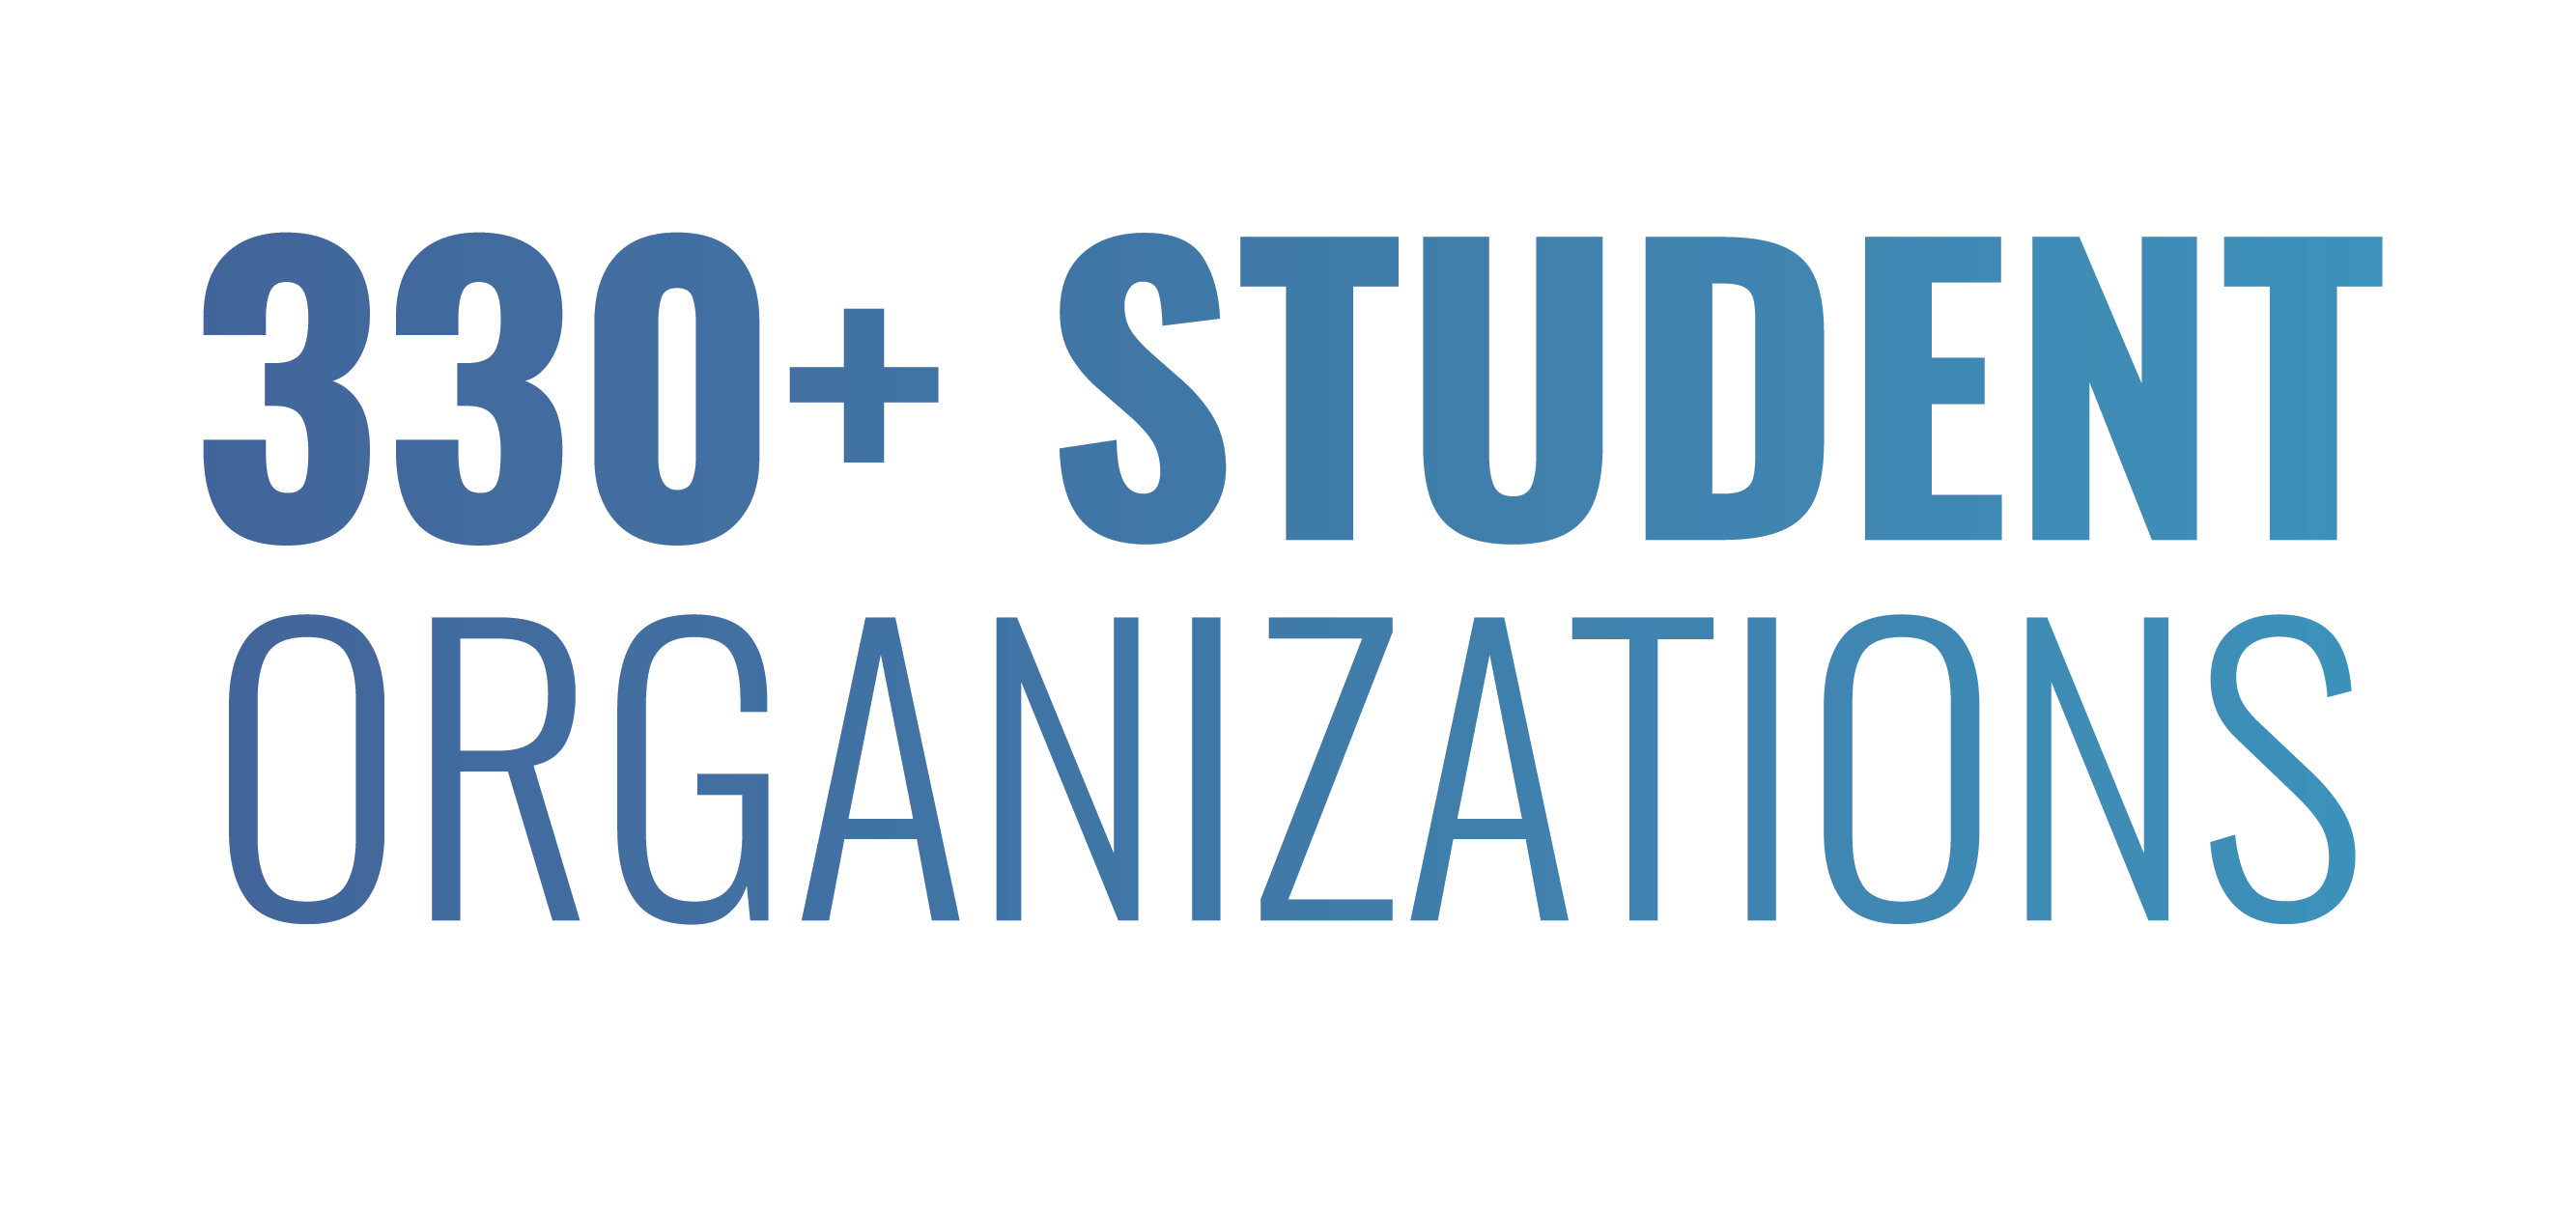 330+ student organizations